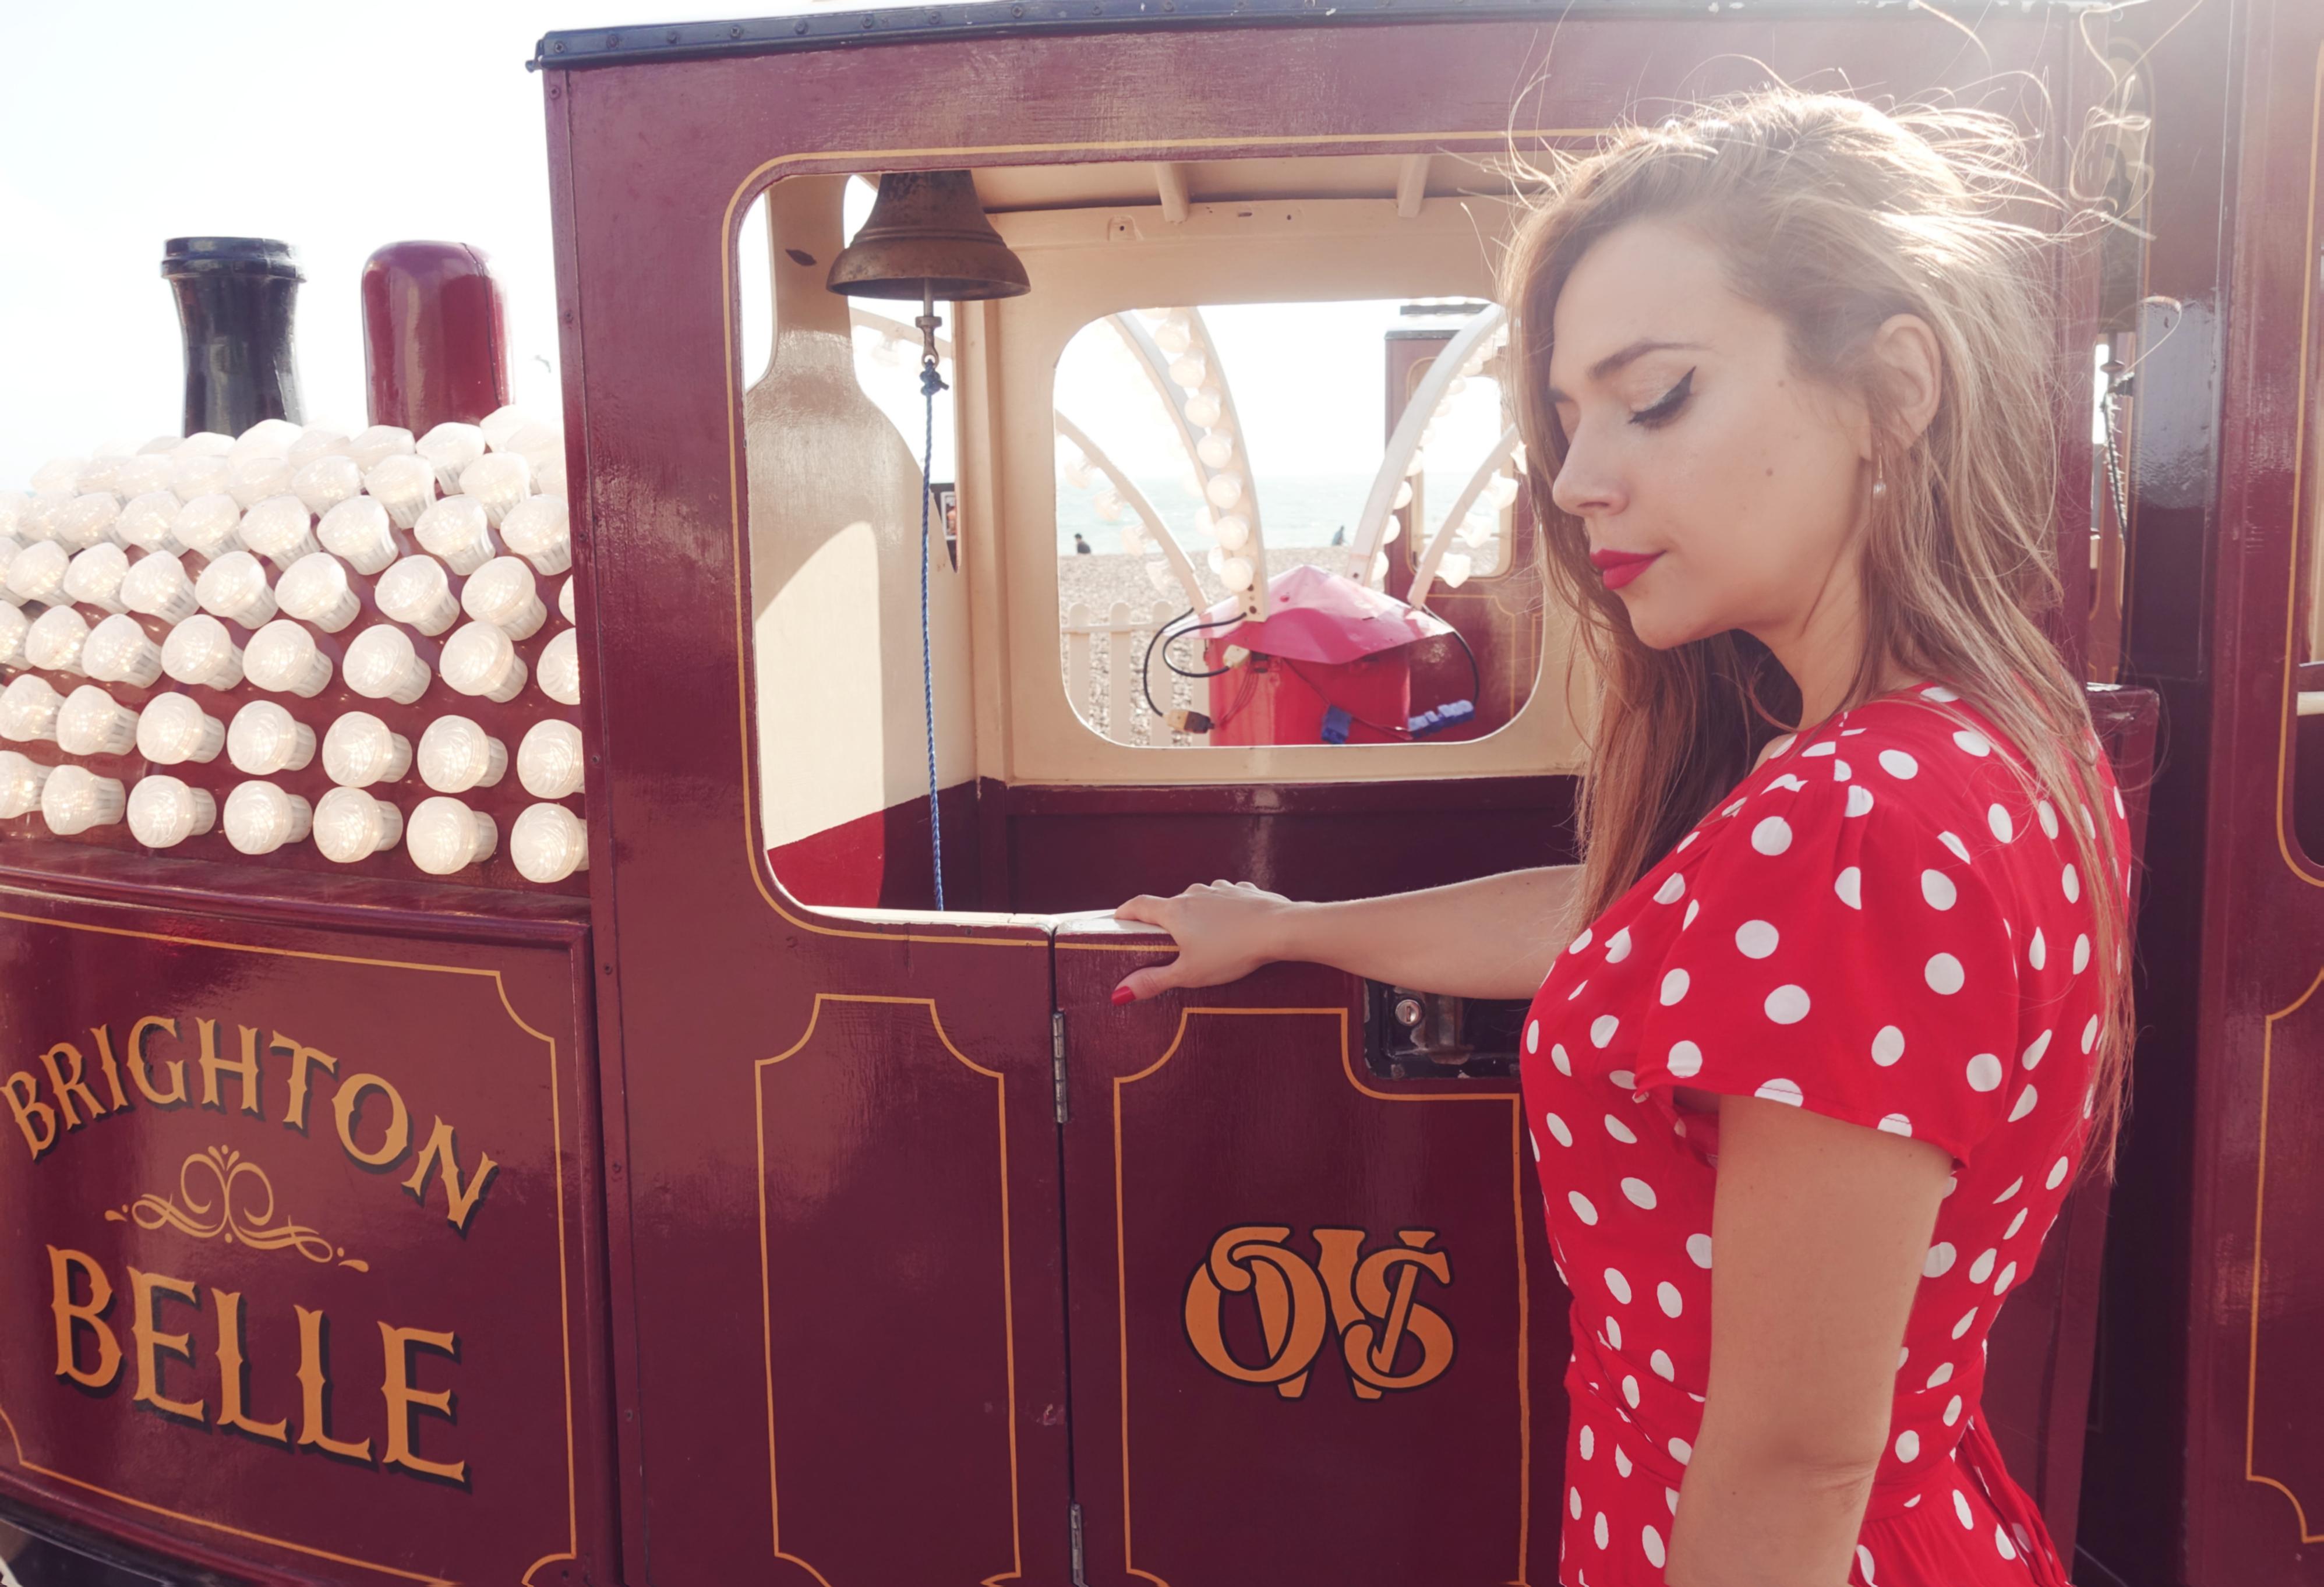 Vestidos-de-lunares-ChicAdicta-blog-de-moda-PiensaenChic-fashionista-polkadot-dress-influencer-Brighton-Piensa-en-Chic-travel-Chic-adicta